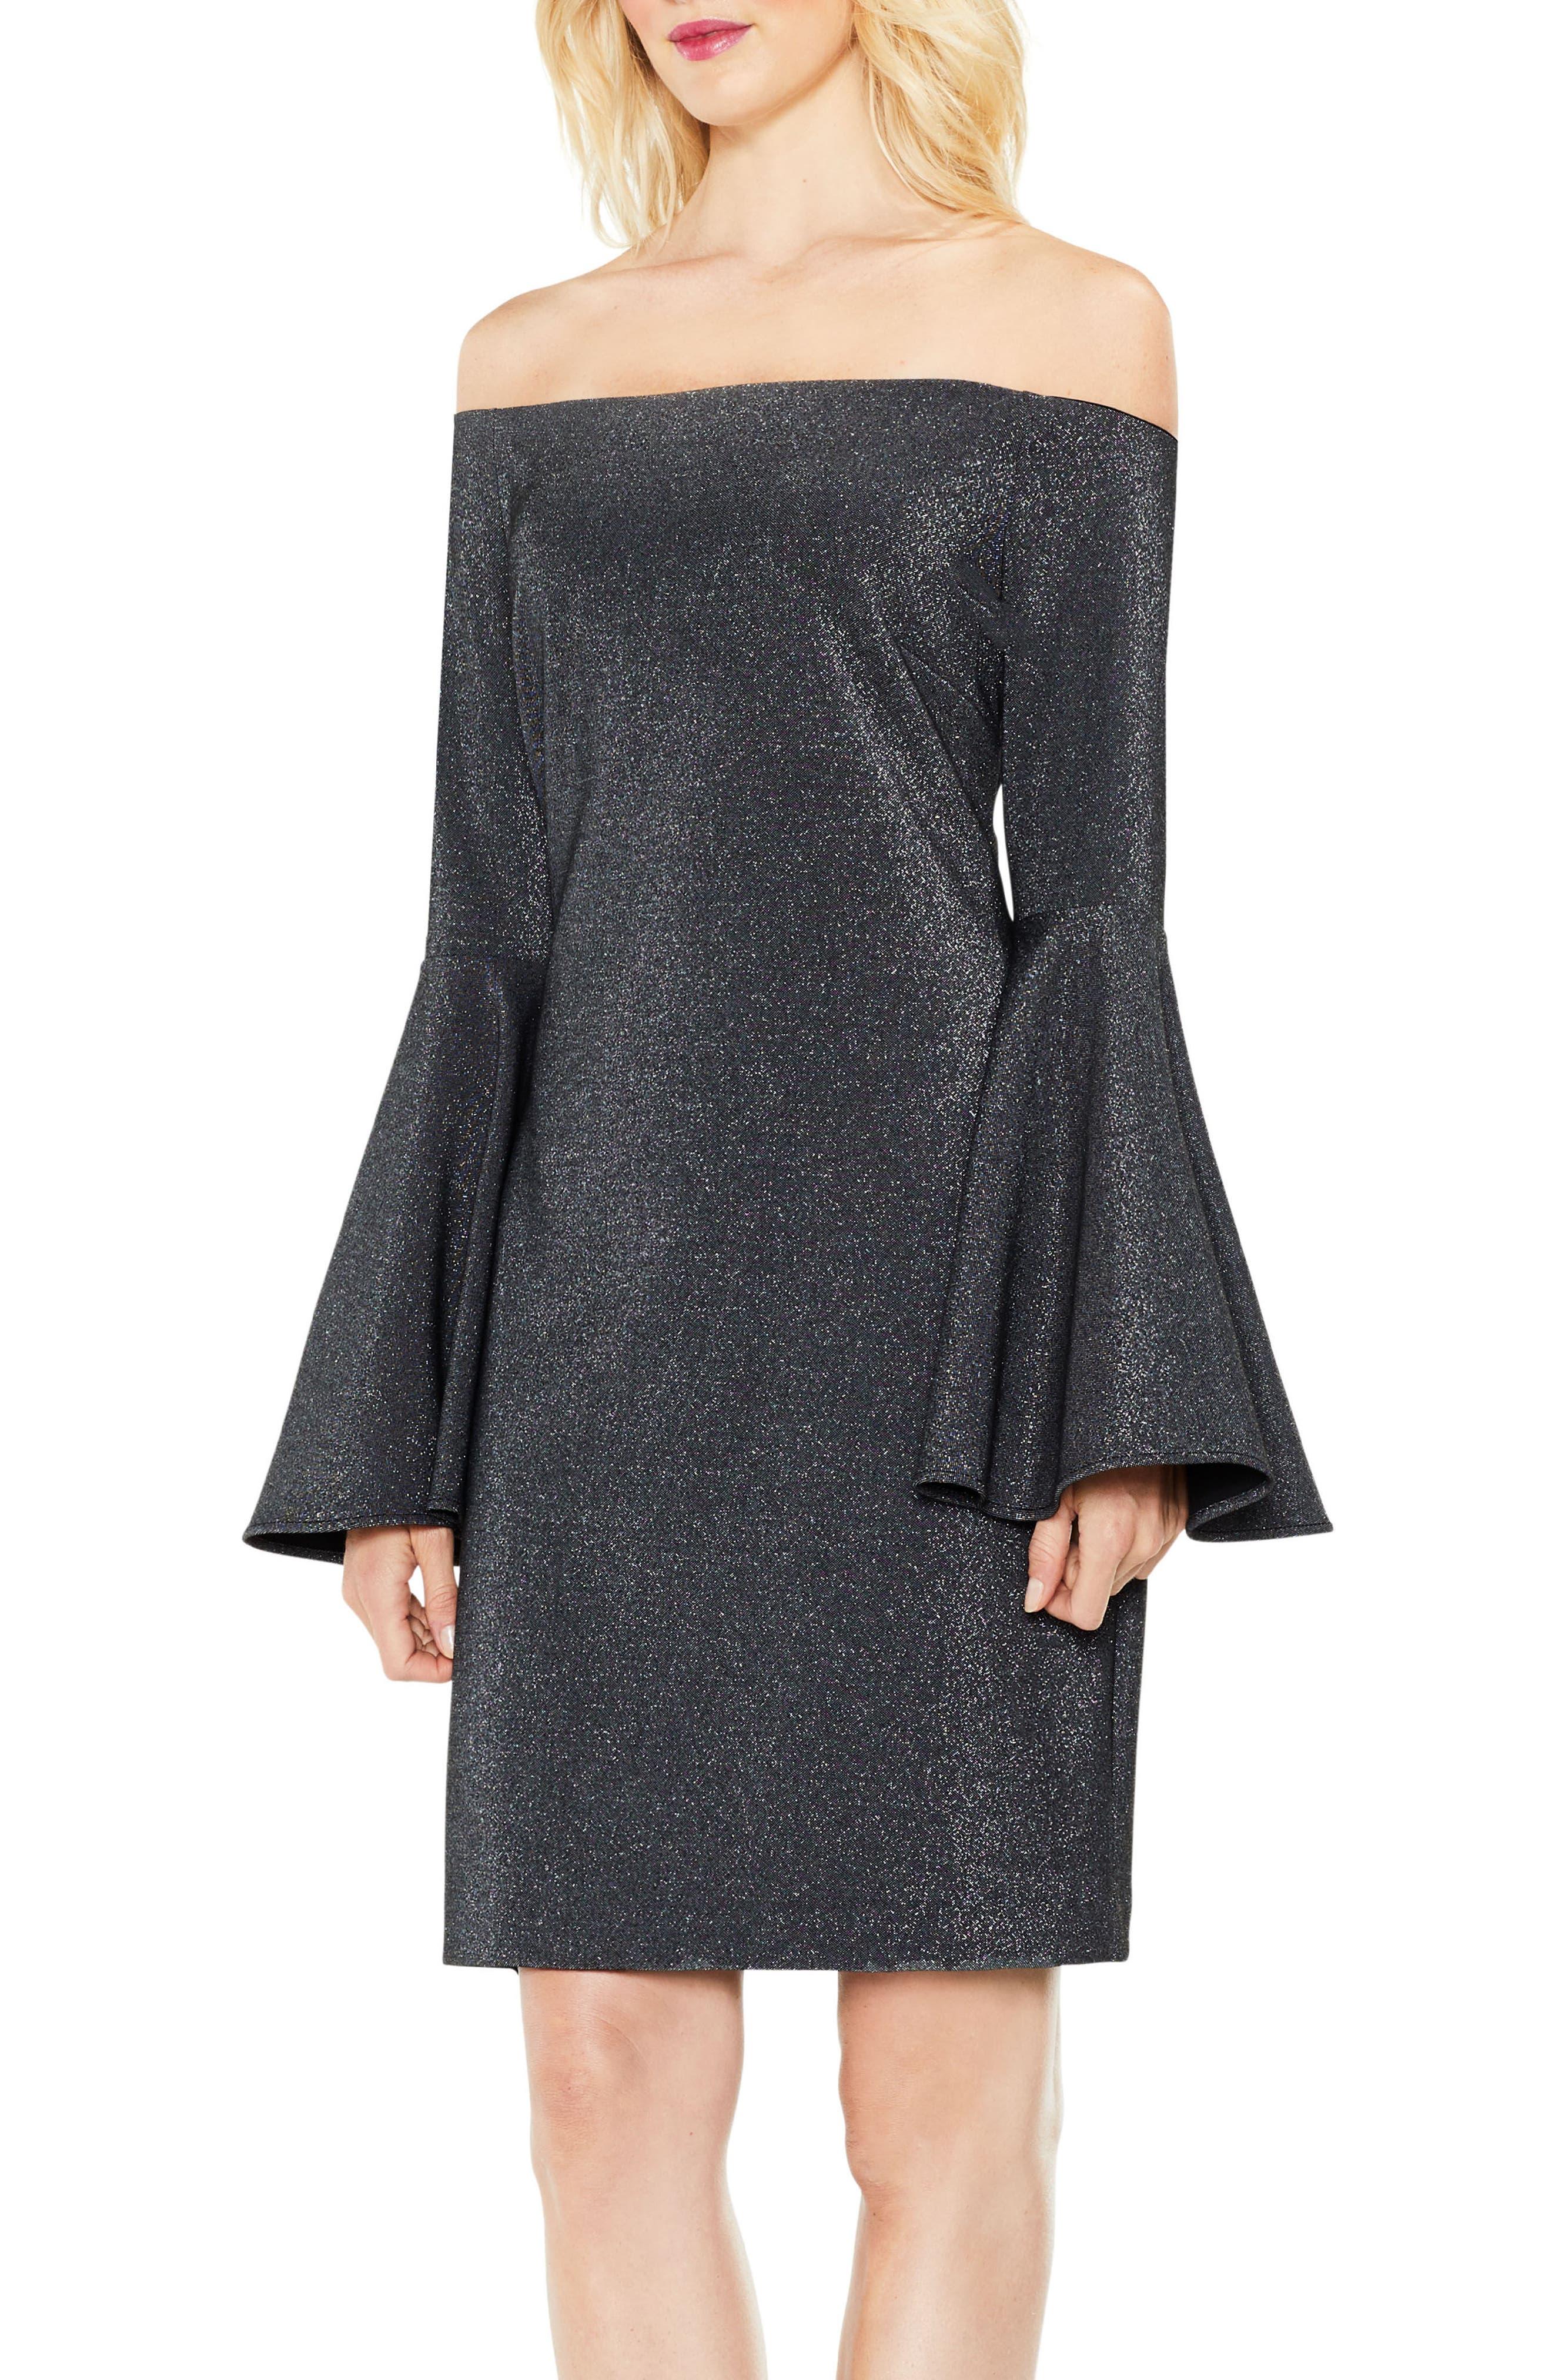 Main Image - Vince Camuto Off the Shoulder Metallic Knit Dress